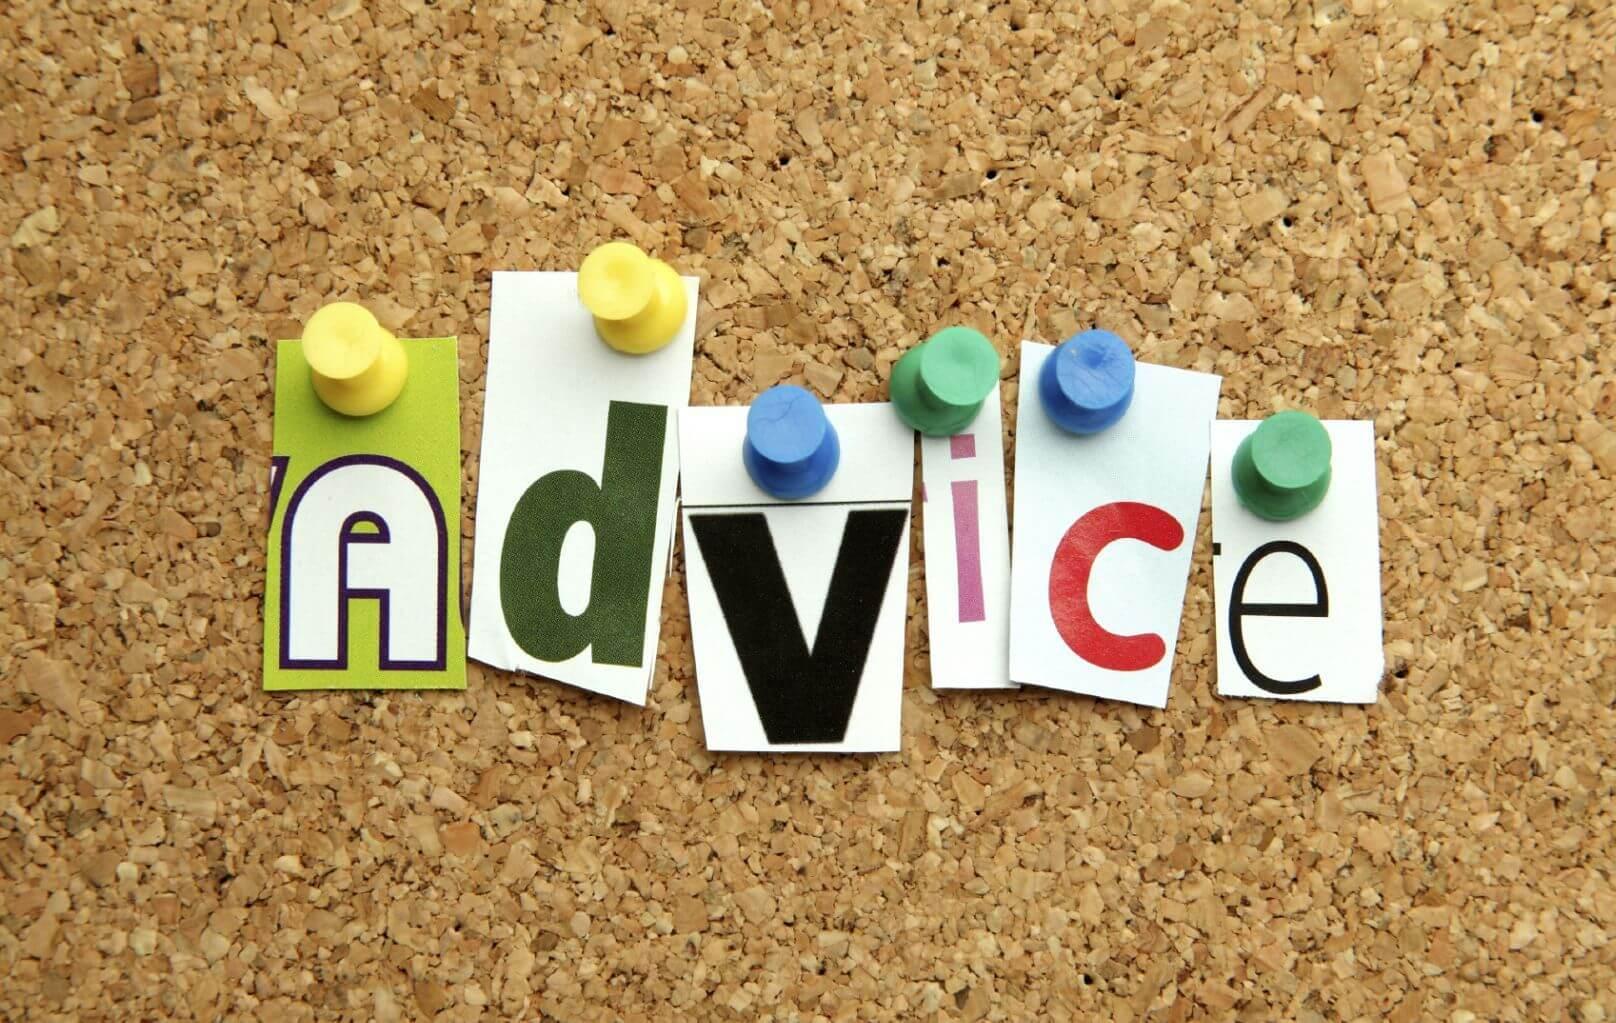 Word advice tacked up on corkboard